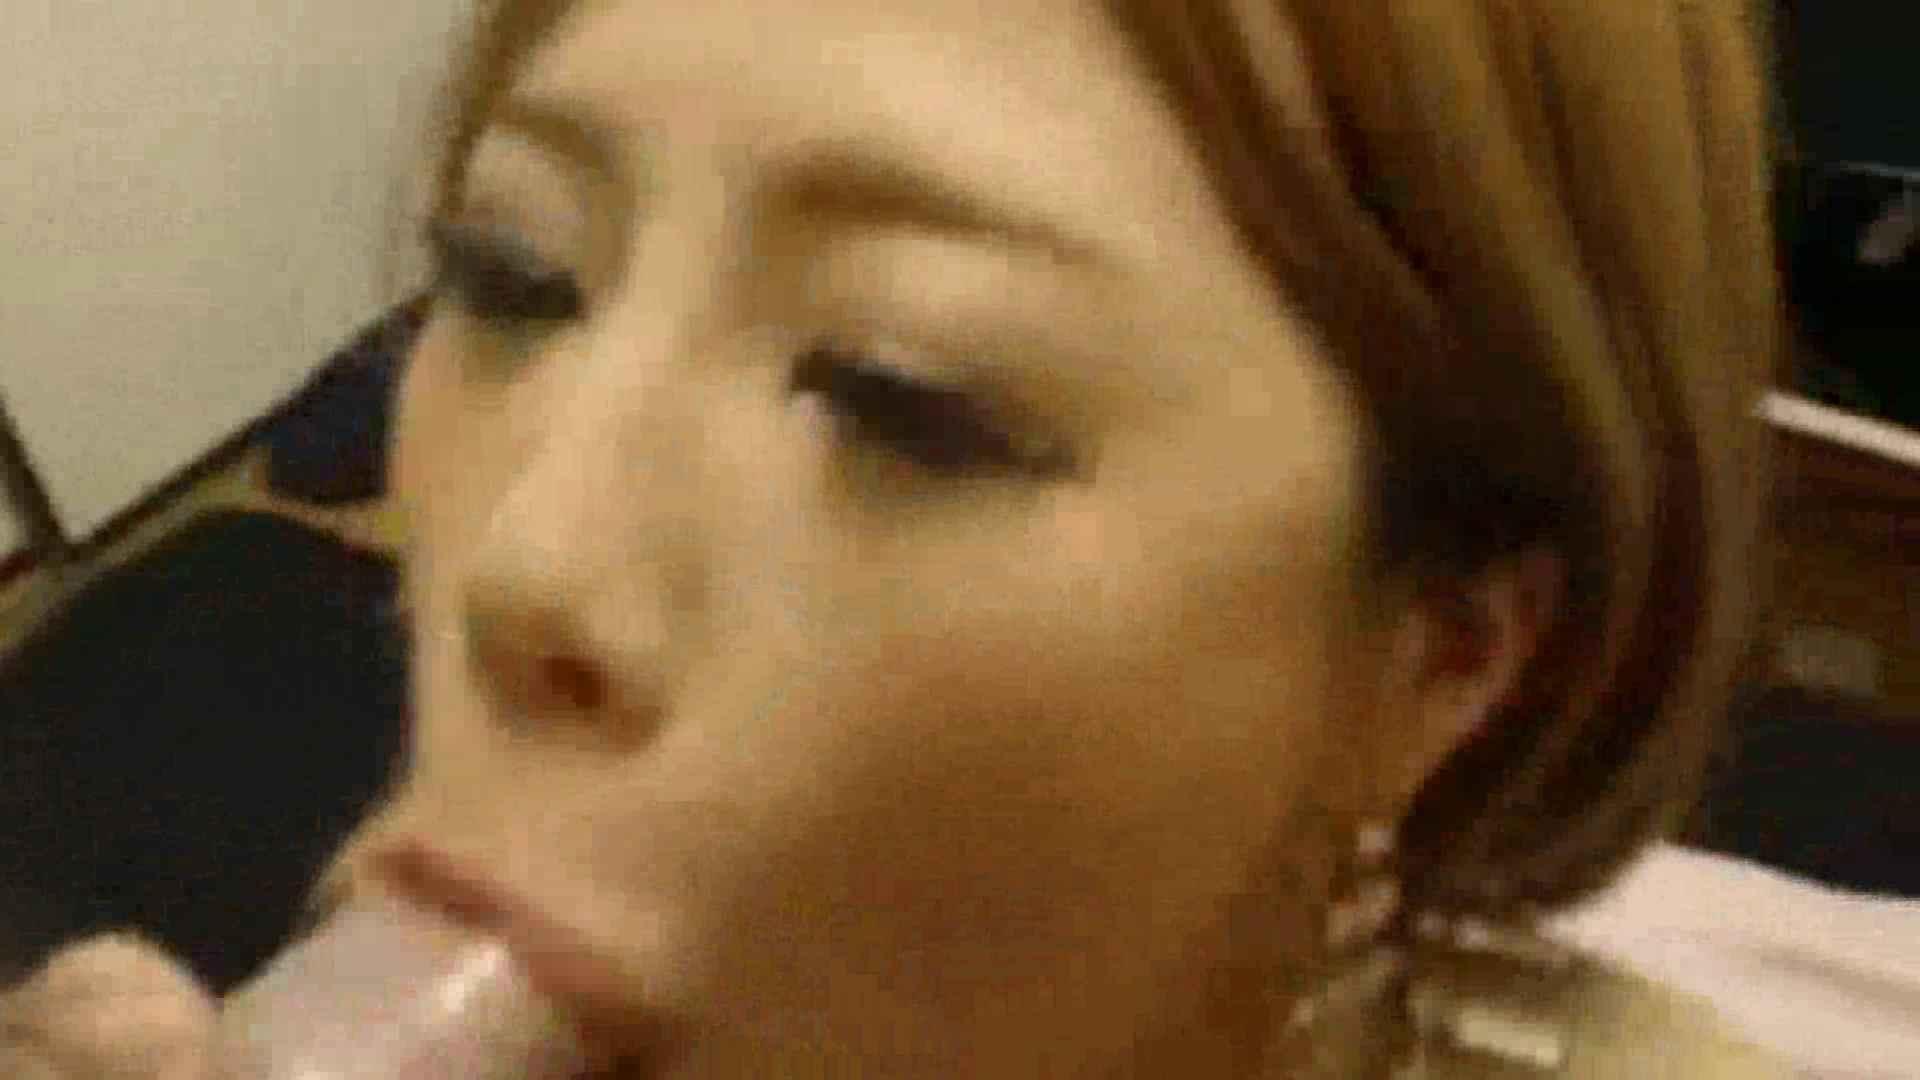 S級ギャルのハメ撮り!生チャット!Vol.16後編 素人 セックス無修正動画無料 50枚